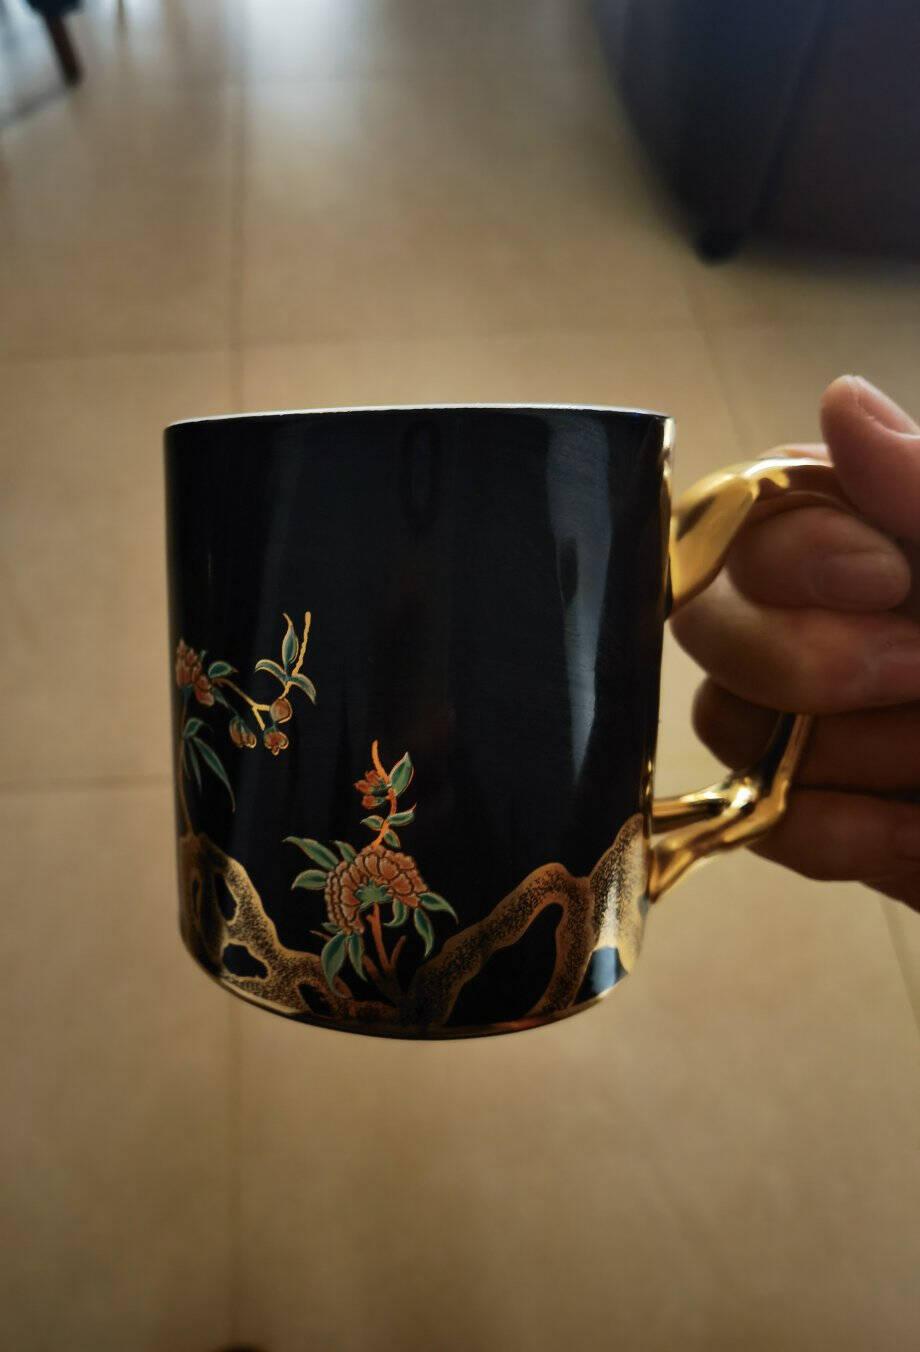 auratic国瓷永丰源350ml中国风情侣陶瓷马克杯水杯茶杯350ml马克杯-902001902001